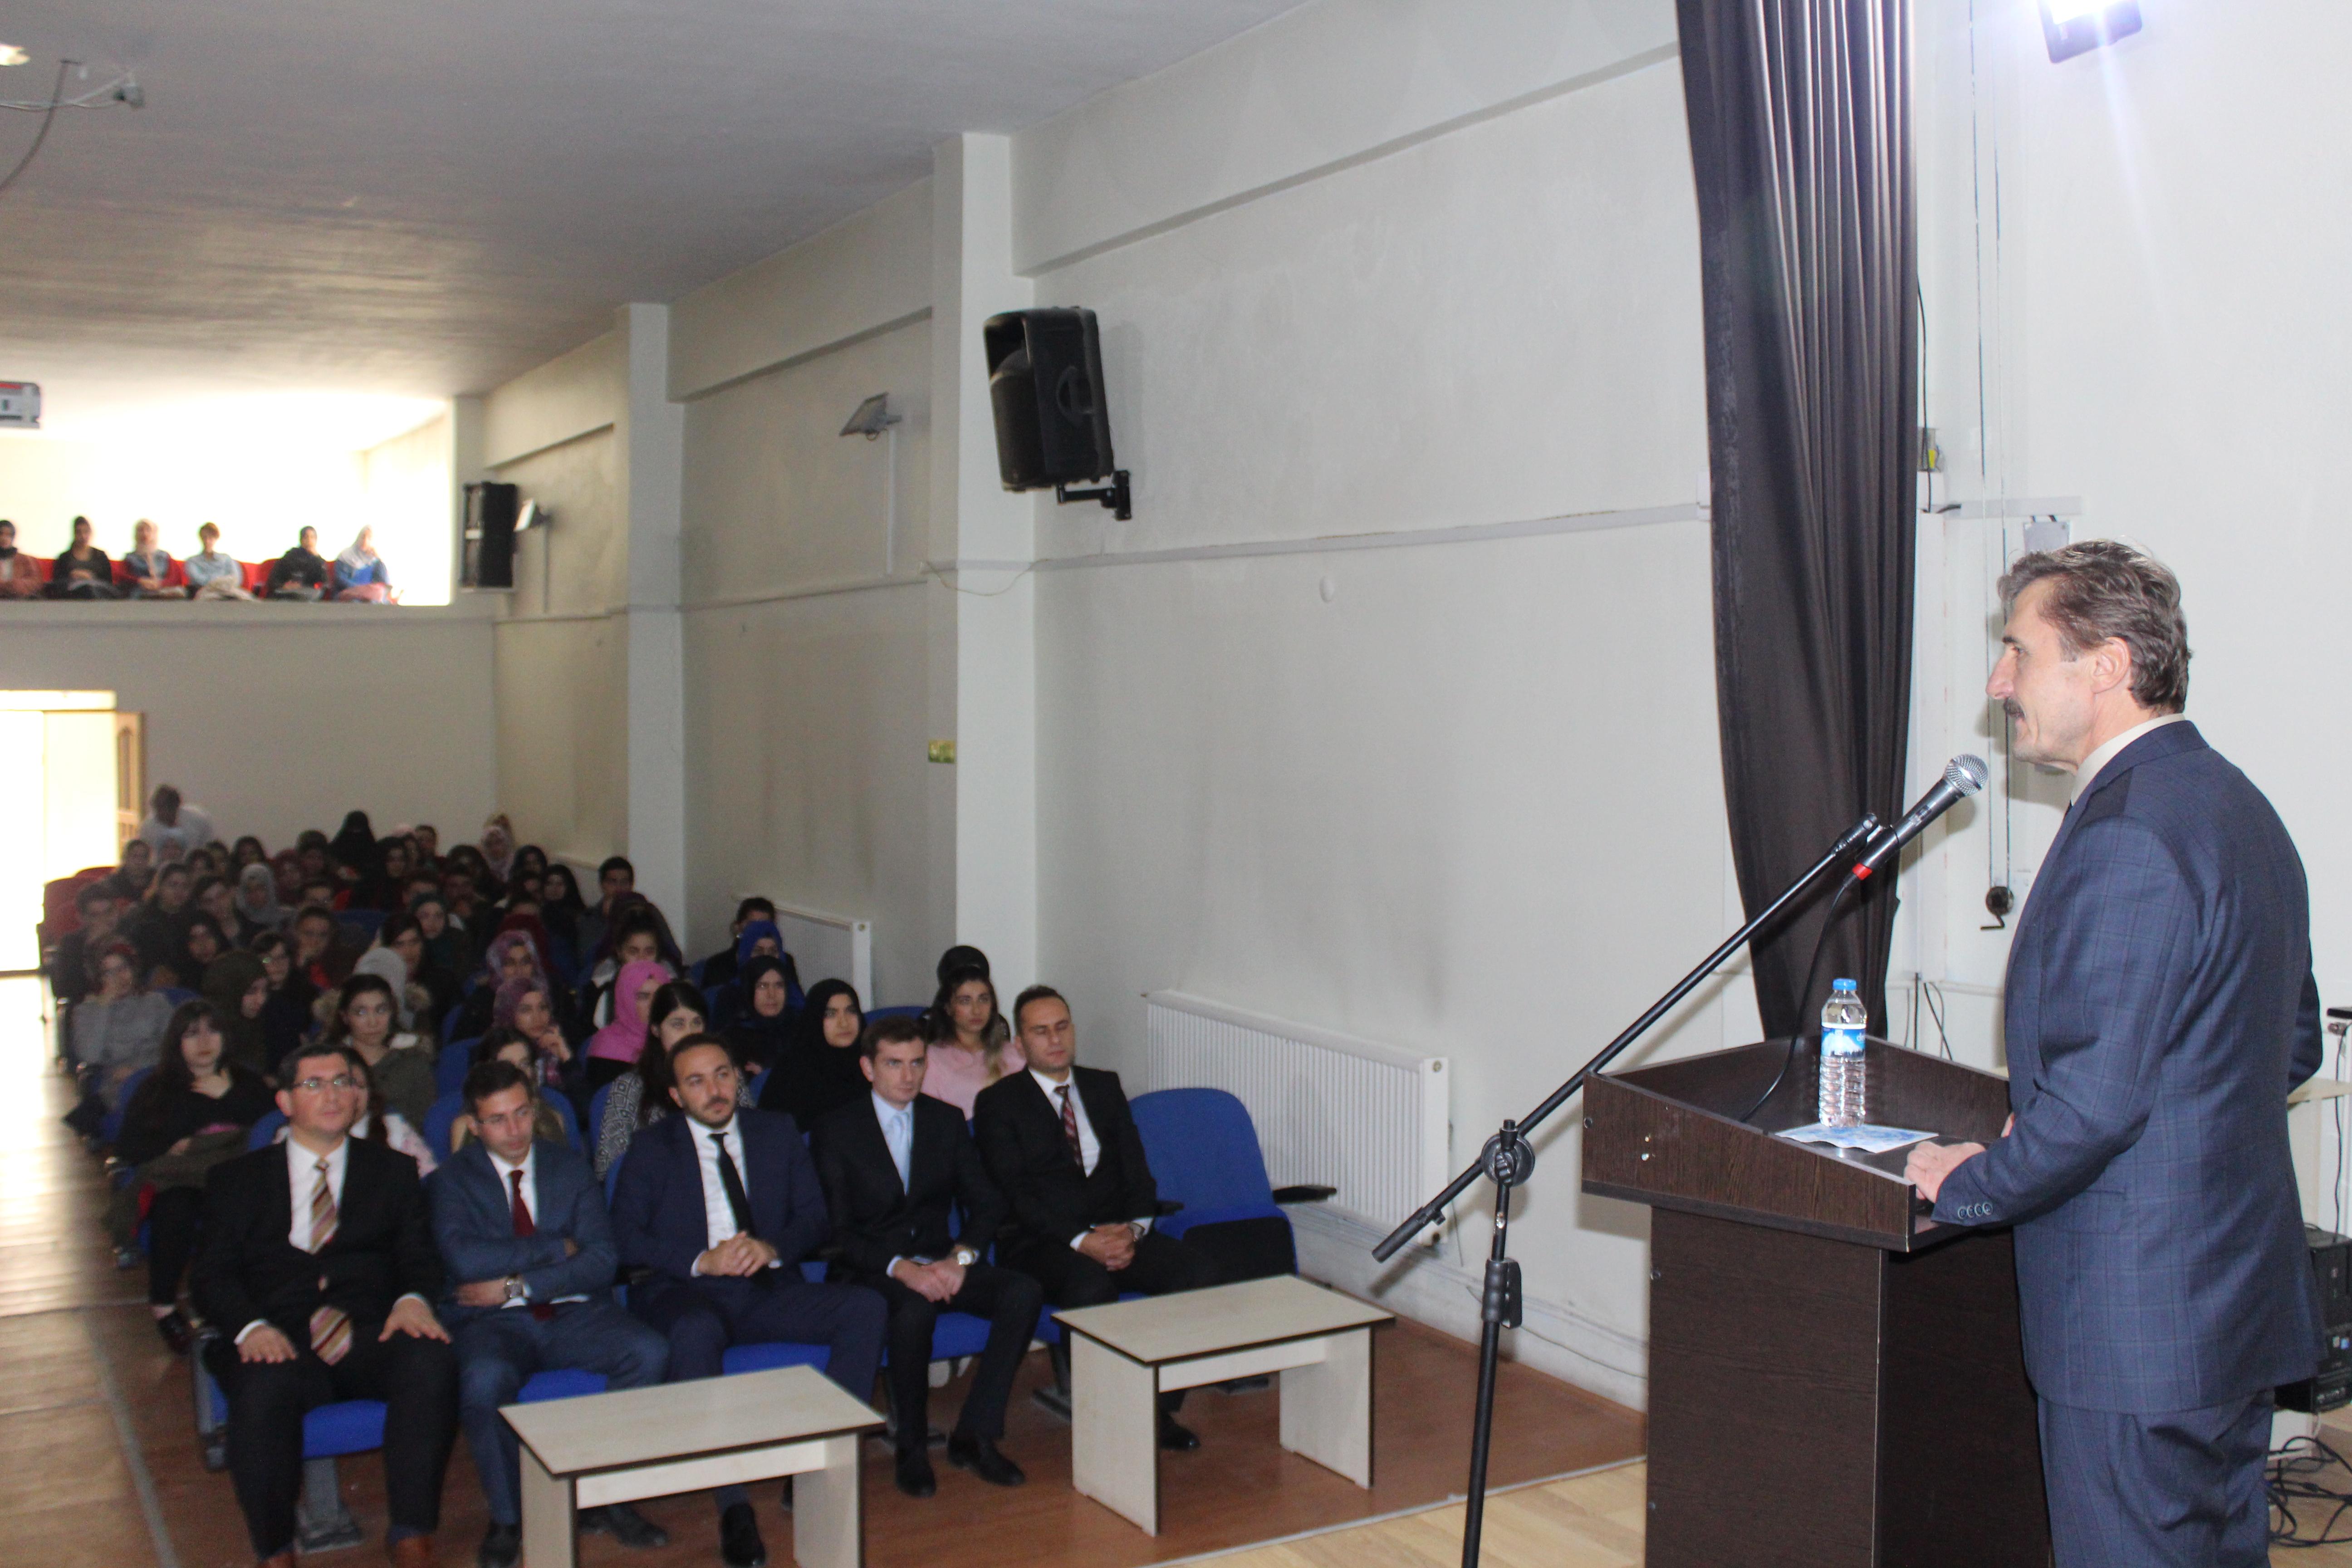 Our Rector has visited Çayırlı Vocational High School